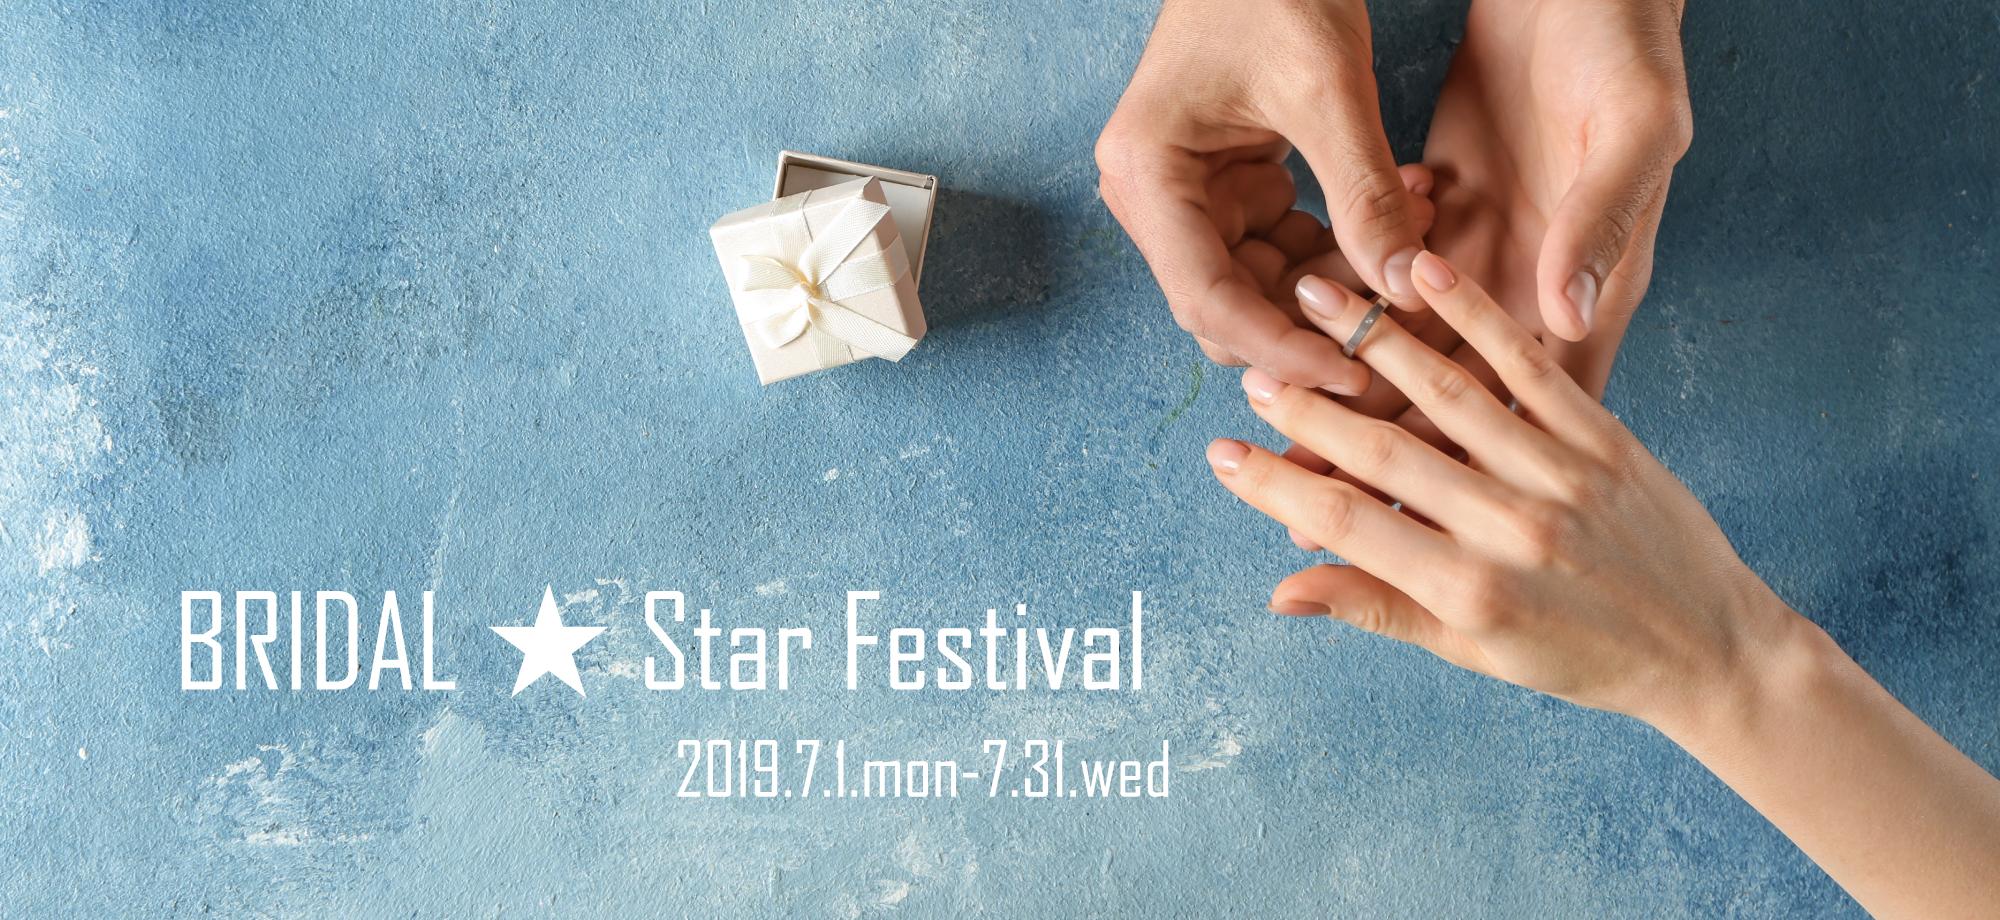 bridal_star_festival_2019_7_2_2000_920_1